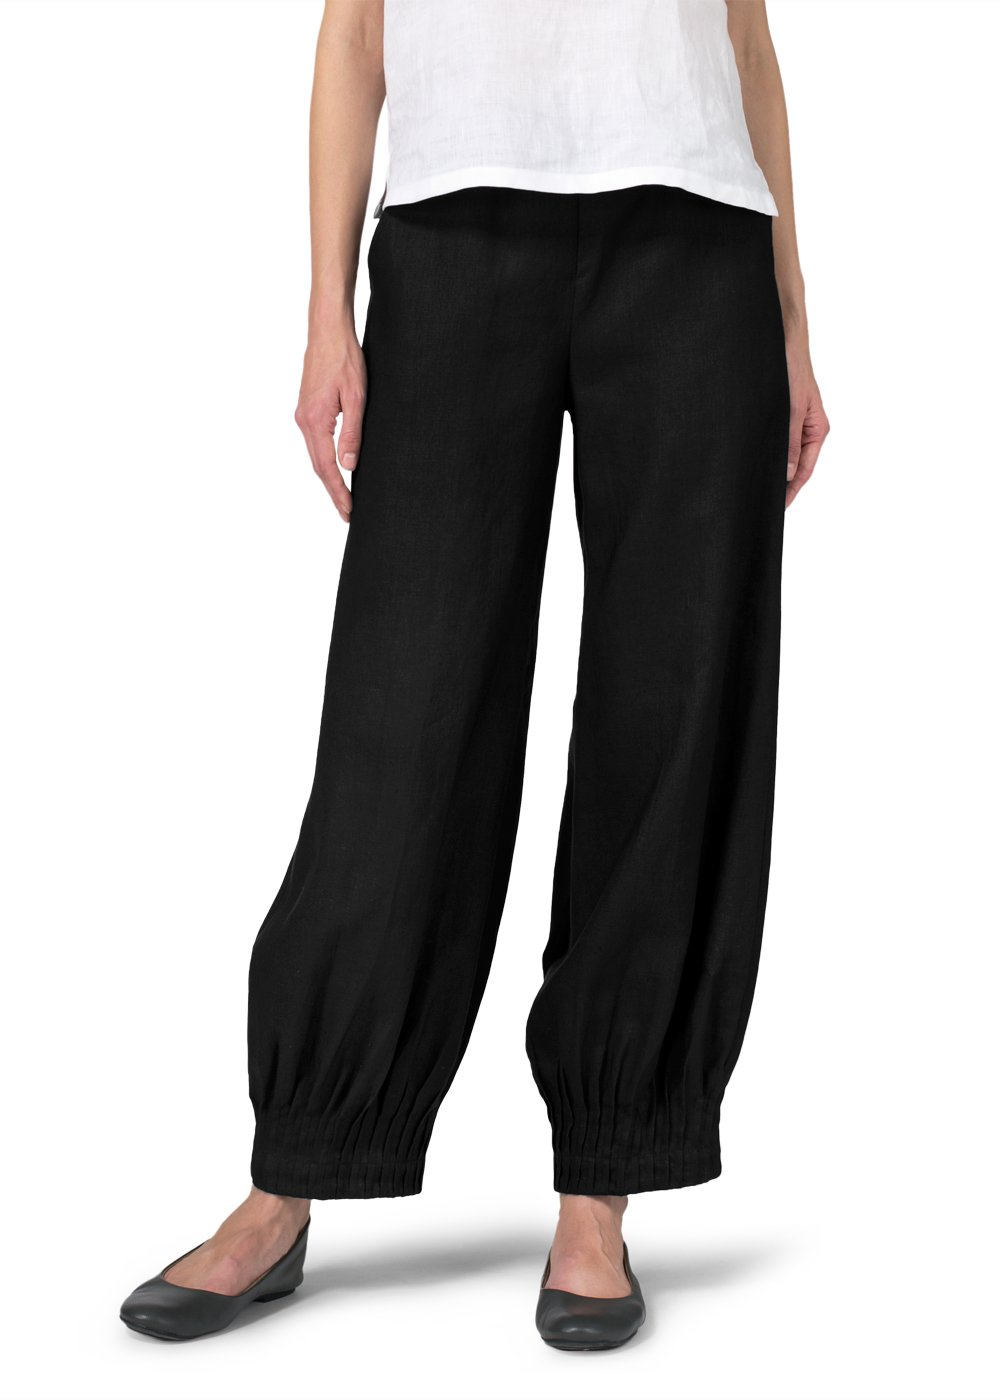 Vivid Linen Pleated Cuff Ankle Length Pants-S-Black by Vivid Linen